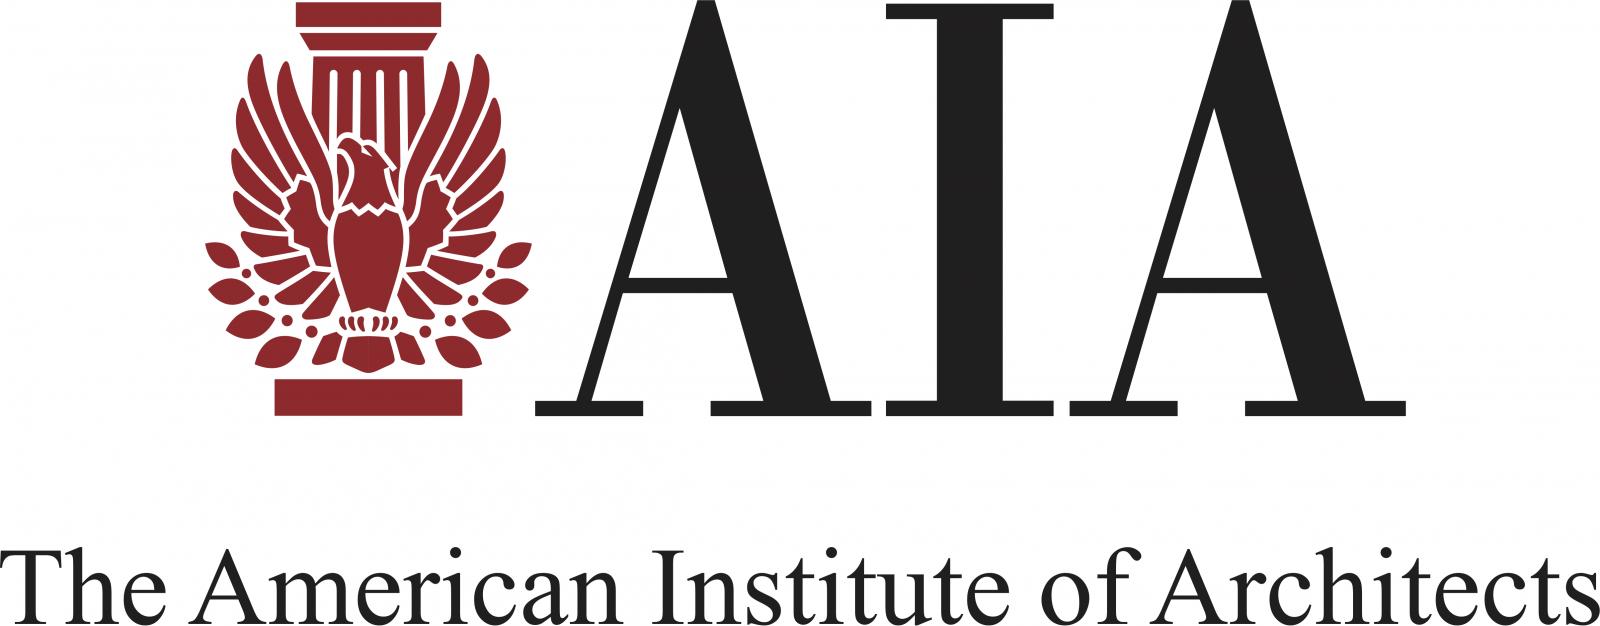 American Institute of Architecture (AIA)